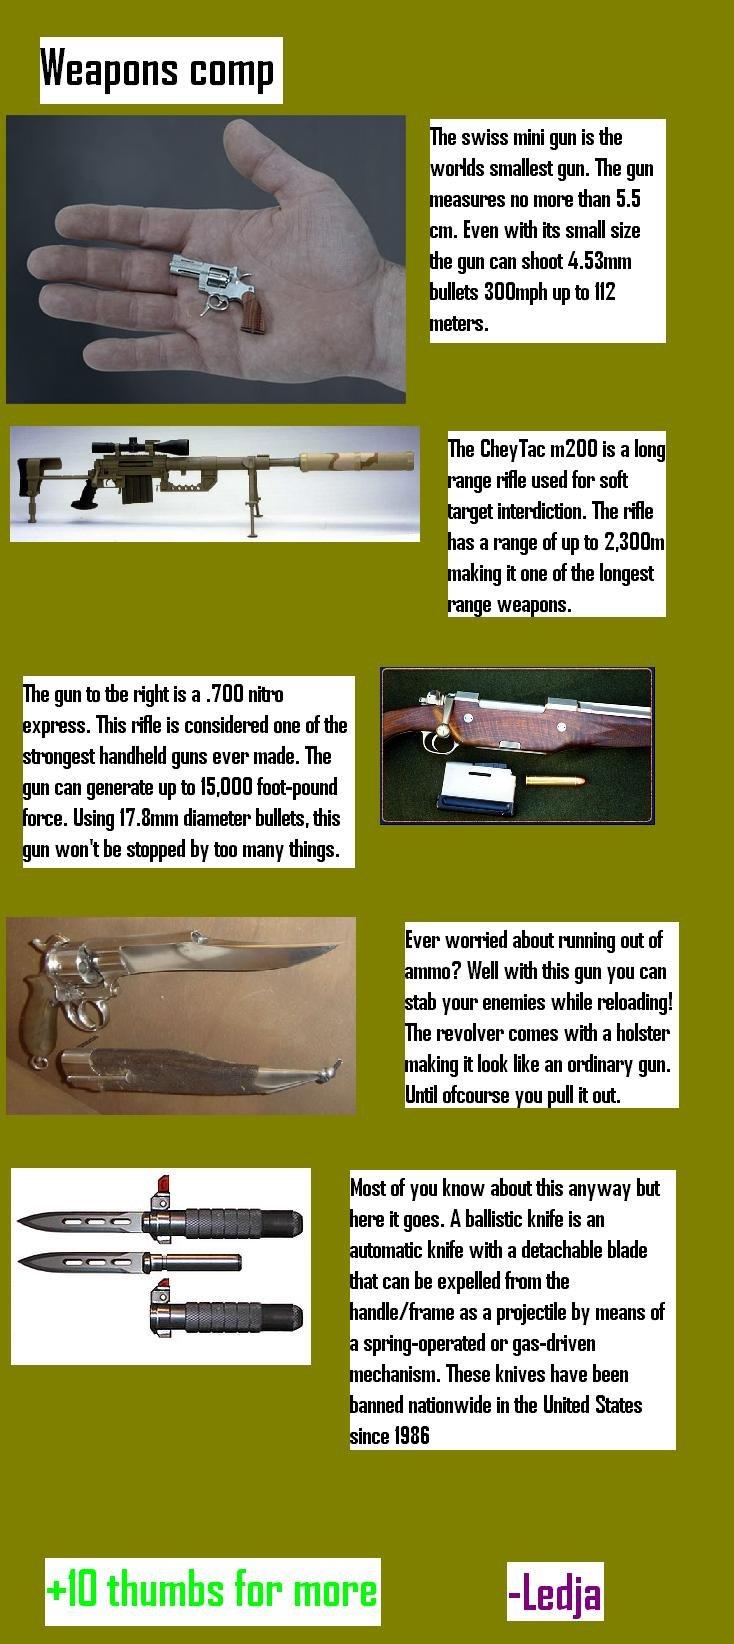 guns. some oc i made.... e gun ta the right is a INTI] HUN I: press. This '. is .'llortt! rd! lrl'! lri. ane at the 1 I handheld guns ever made. The an sen gene weapons ledja